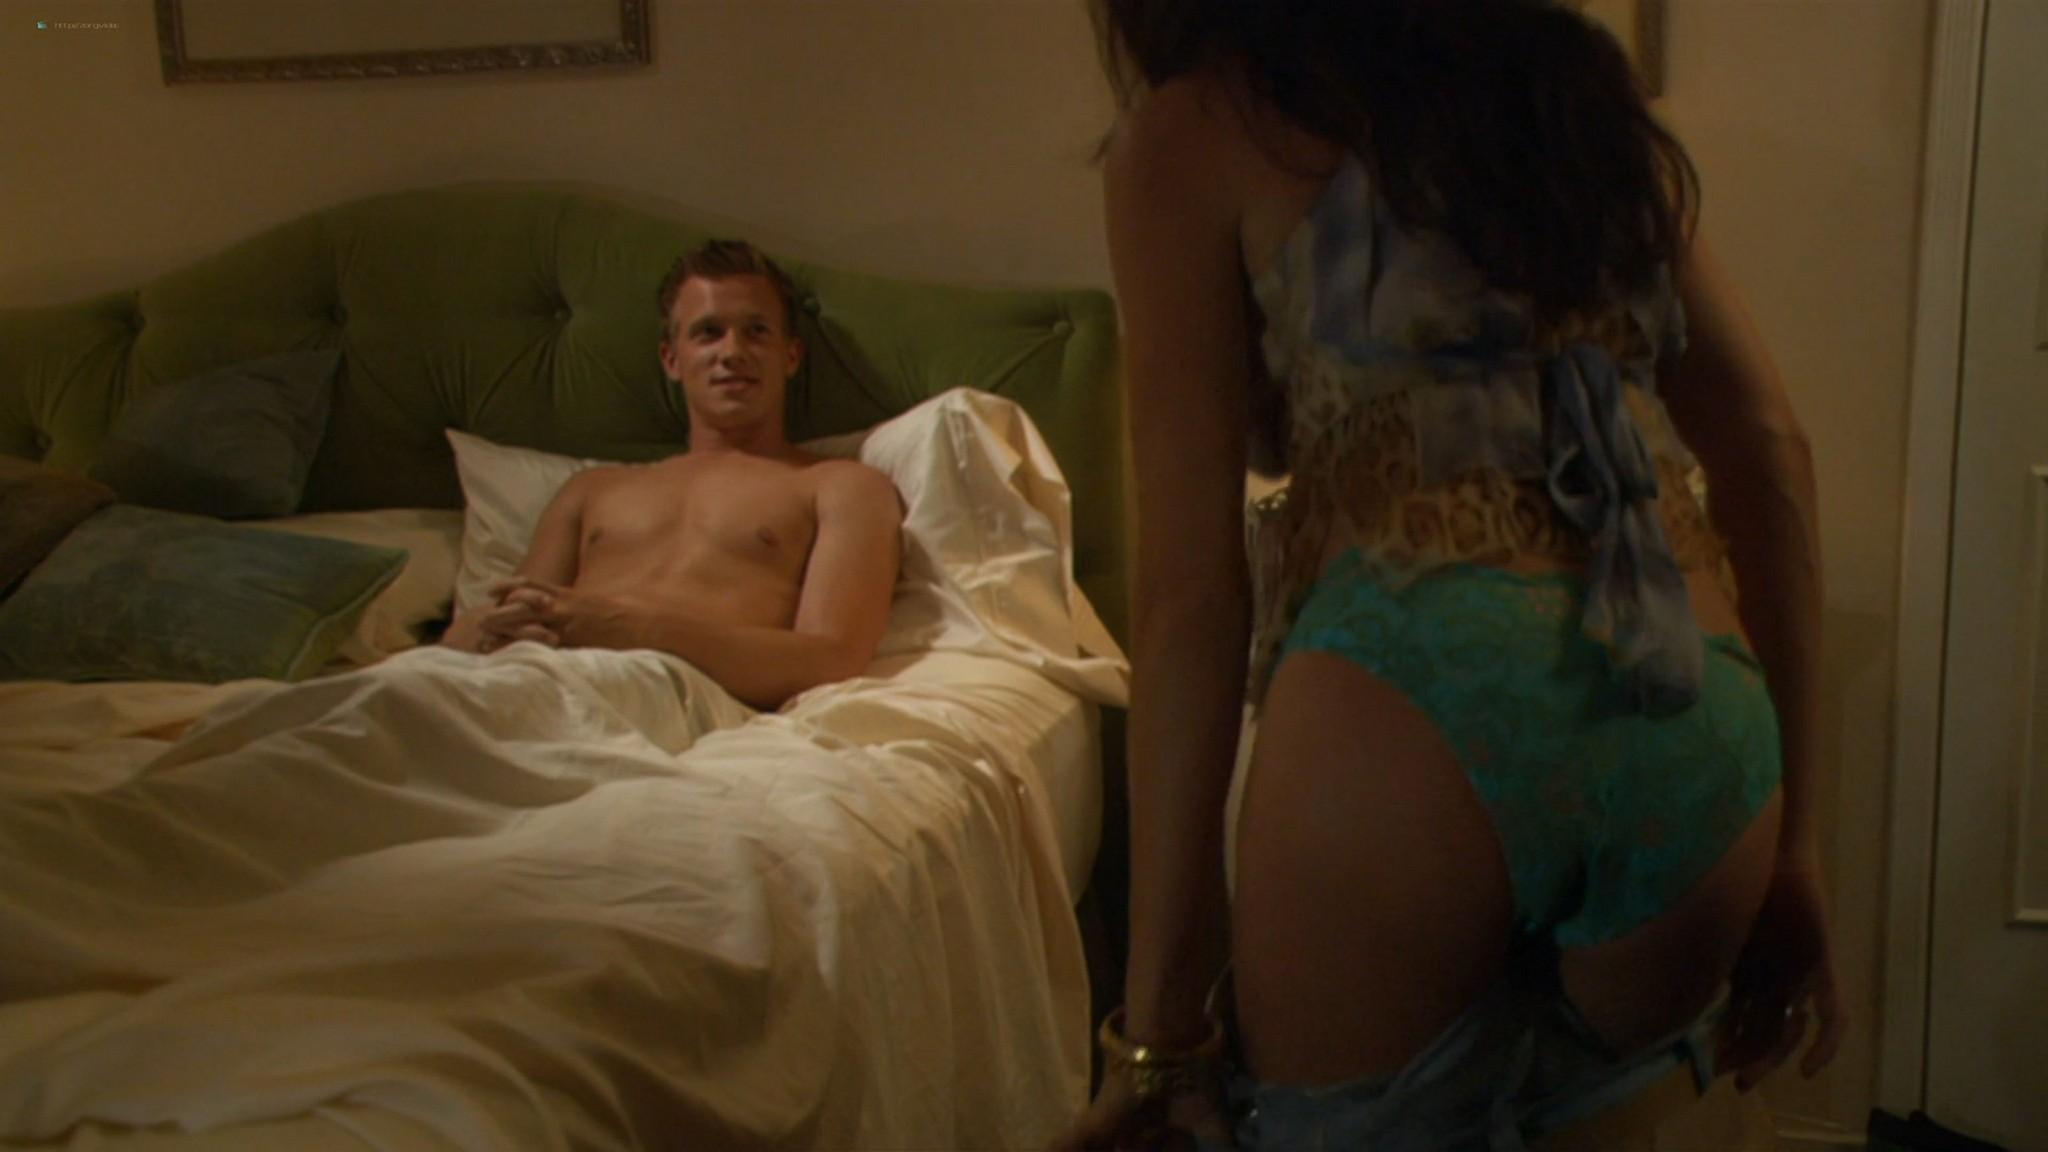 Kaley Cuoco hot Izabella Scorupco sexy others nude - Cougar Club (2007) HD 1080p BluRay (12)